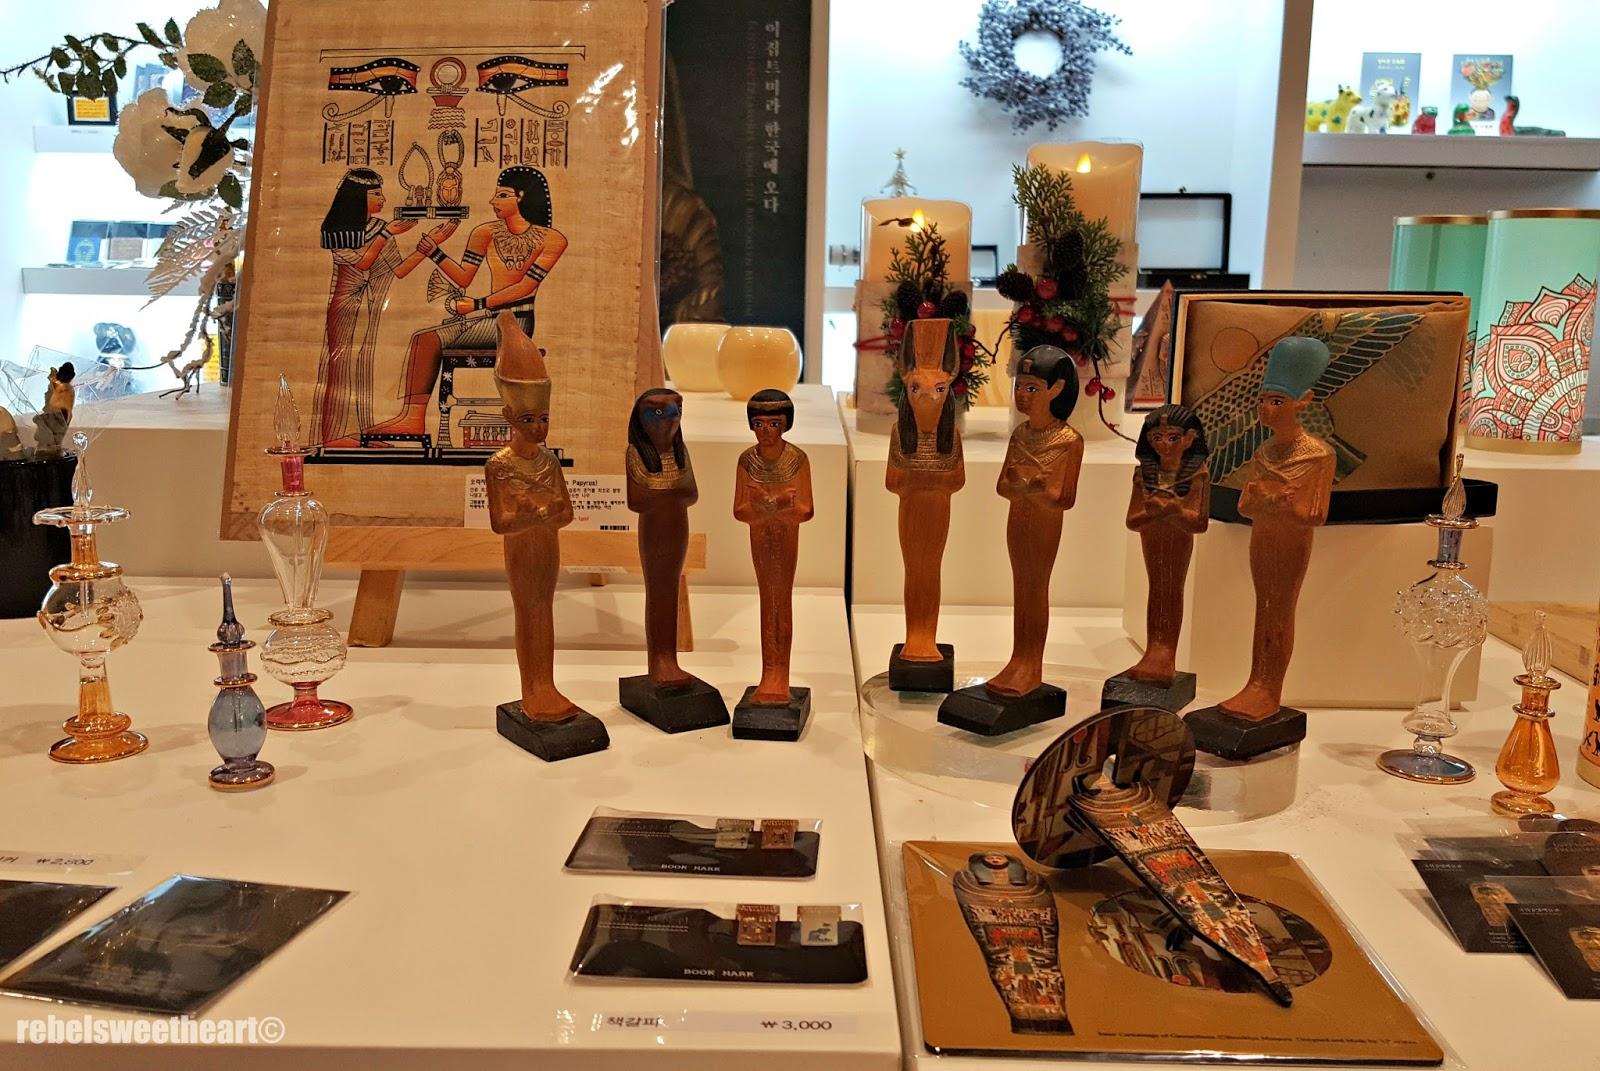 The Rebel Sweetheart.: Seoul Searching   Egyptian